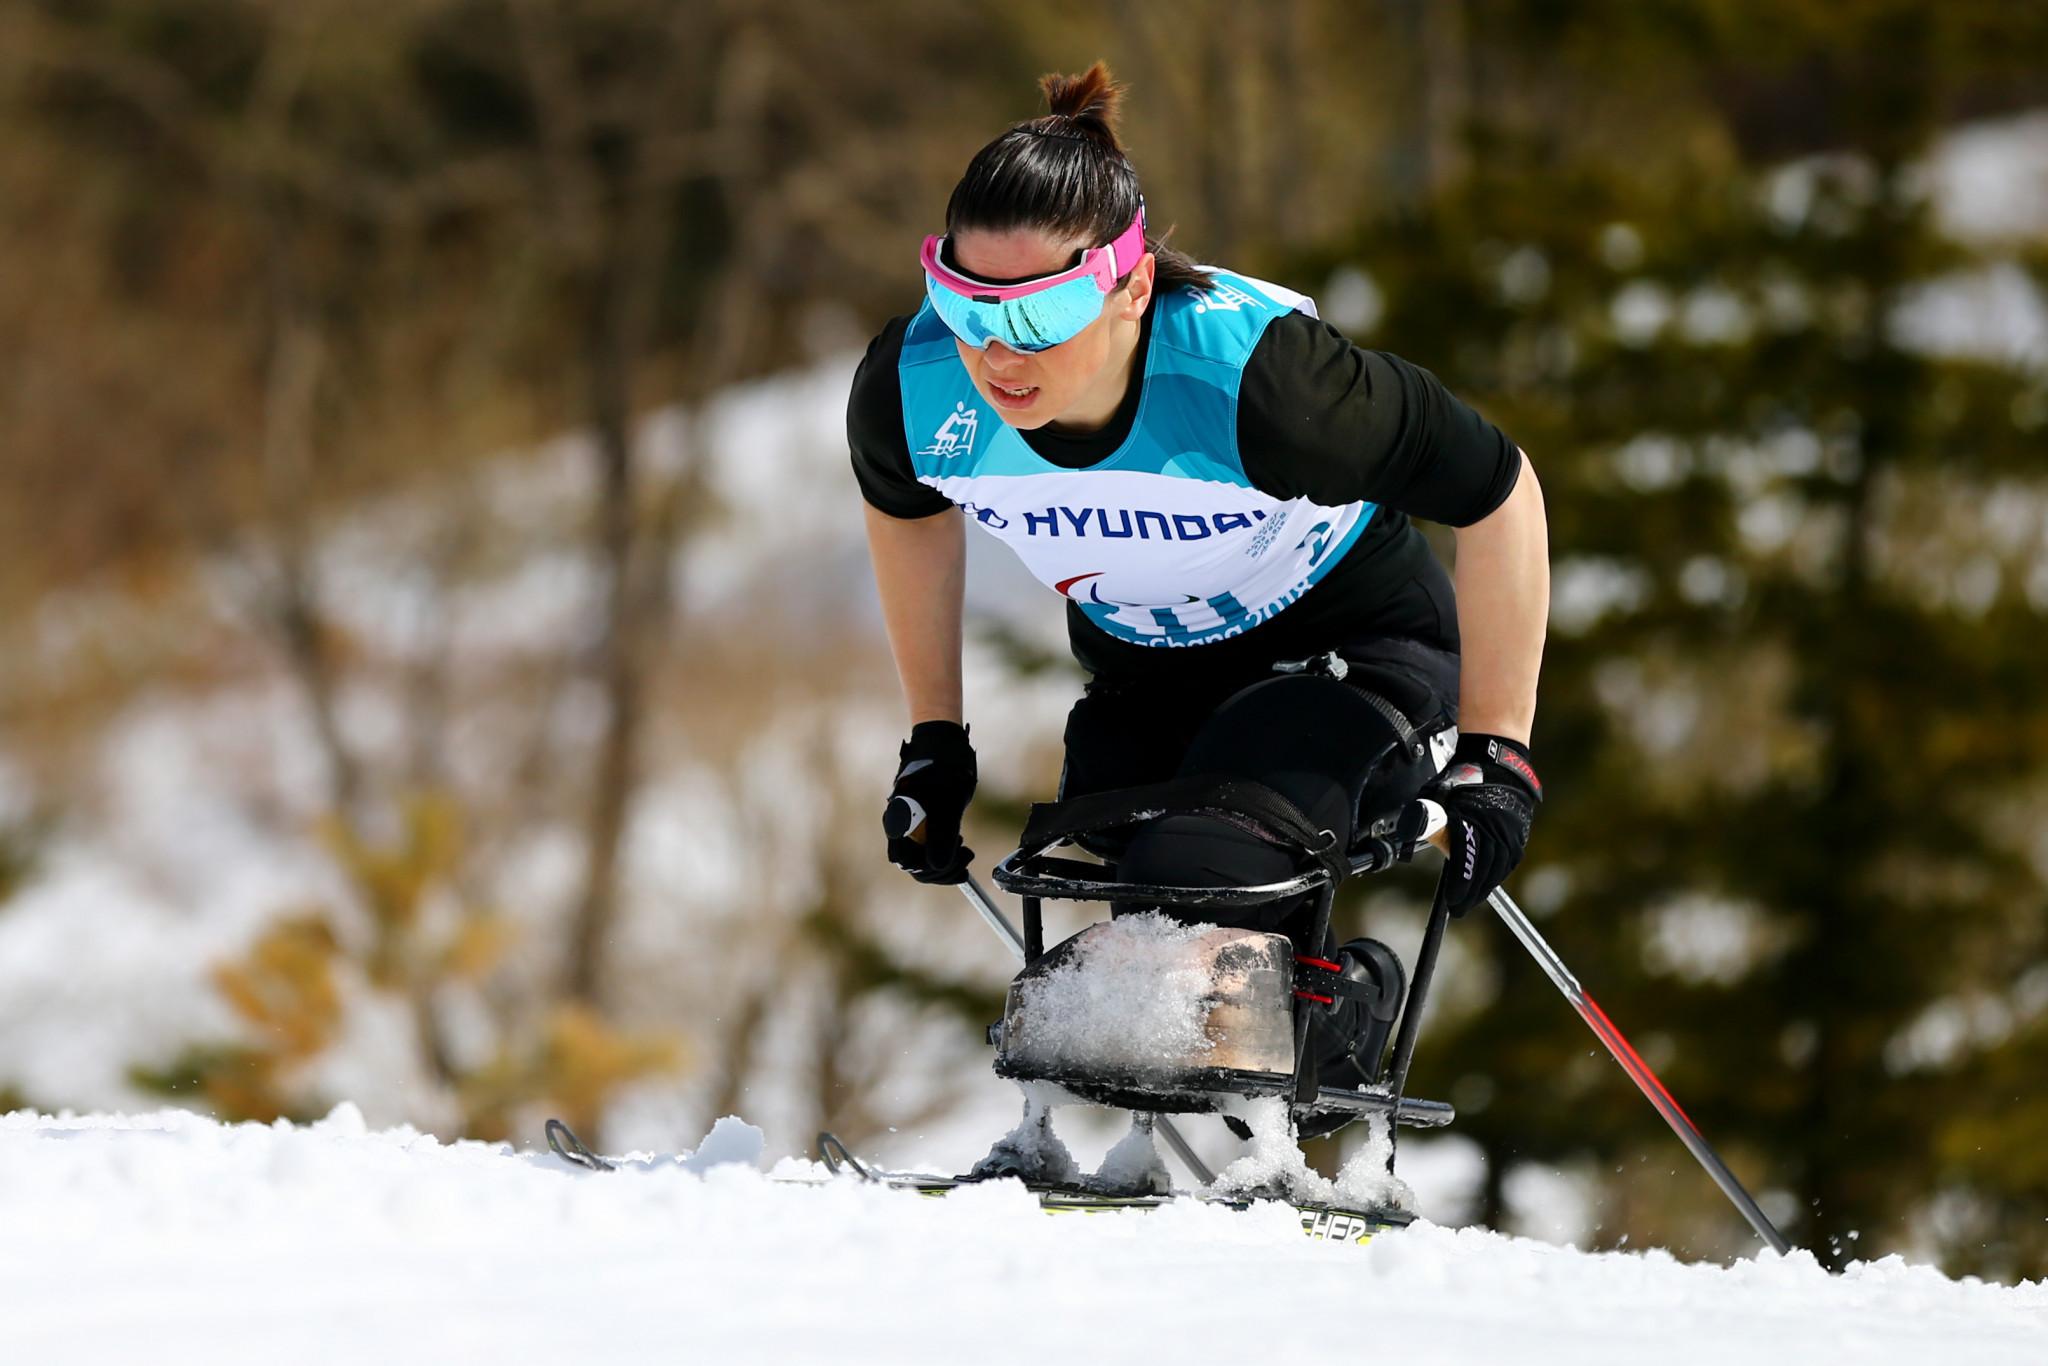 Russia enjoy strong start at World Para Nordic Skiing World Cup in Vuokatti